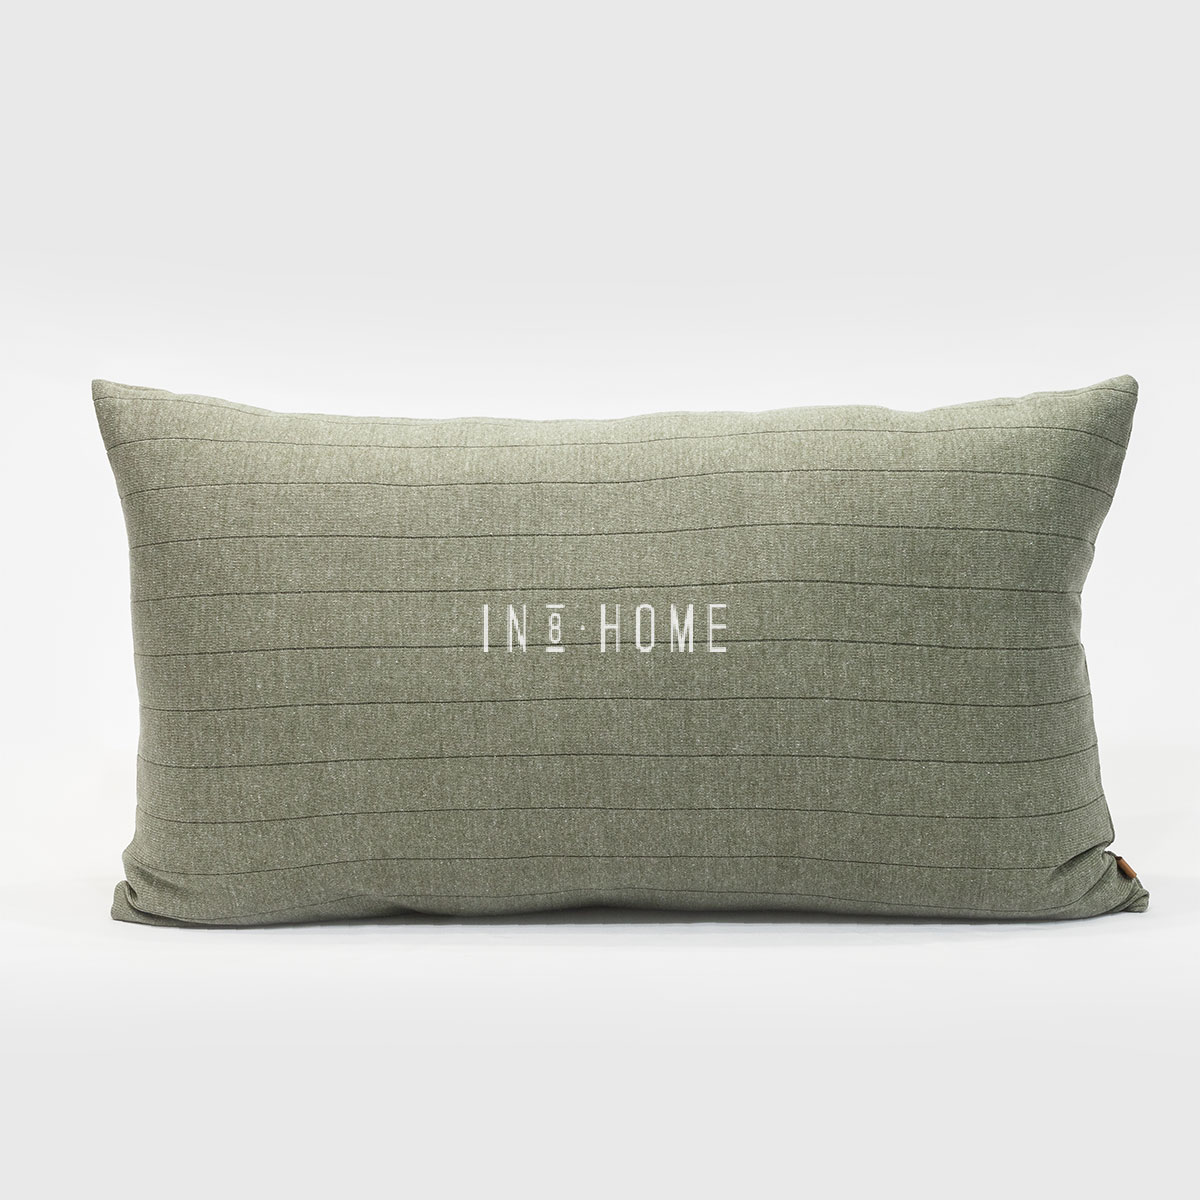 Travesseiro 50x80 mony | Rian Tricot